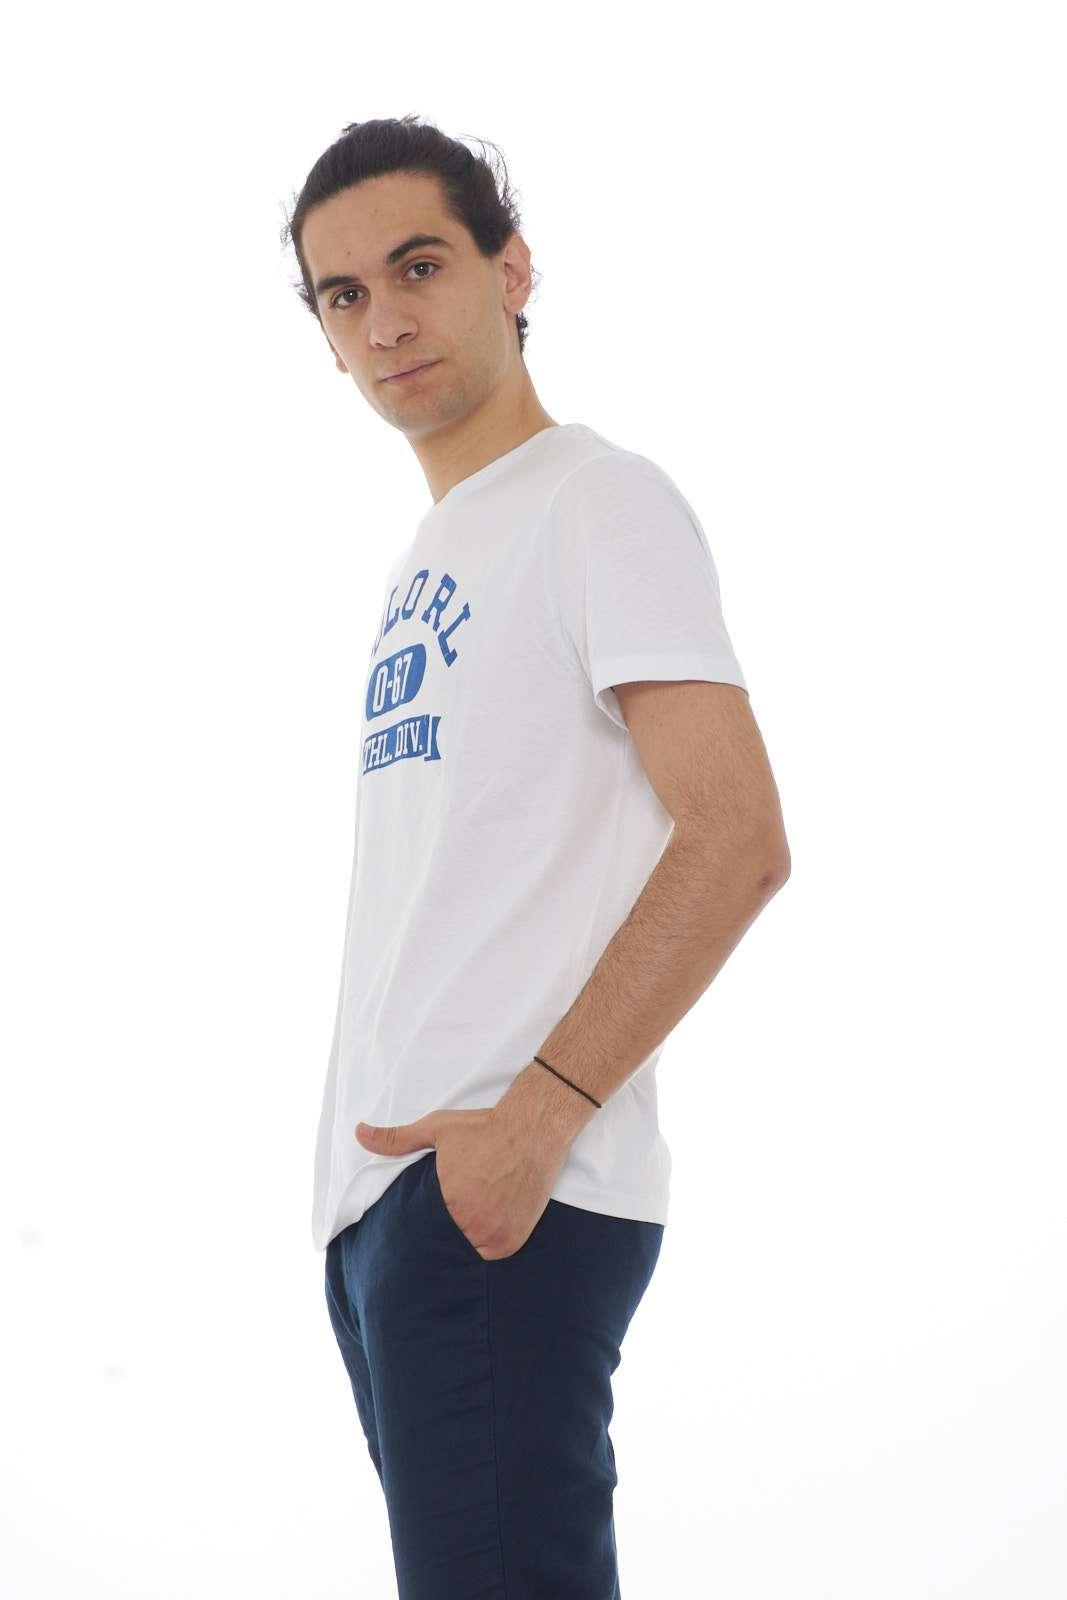 https://www.parmax.com/media/catalog/product/a/i/PE-outlet_parmax-t-shirt-uomo-Polo-ralph-Lauren-710740968-B.jpg